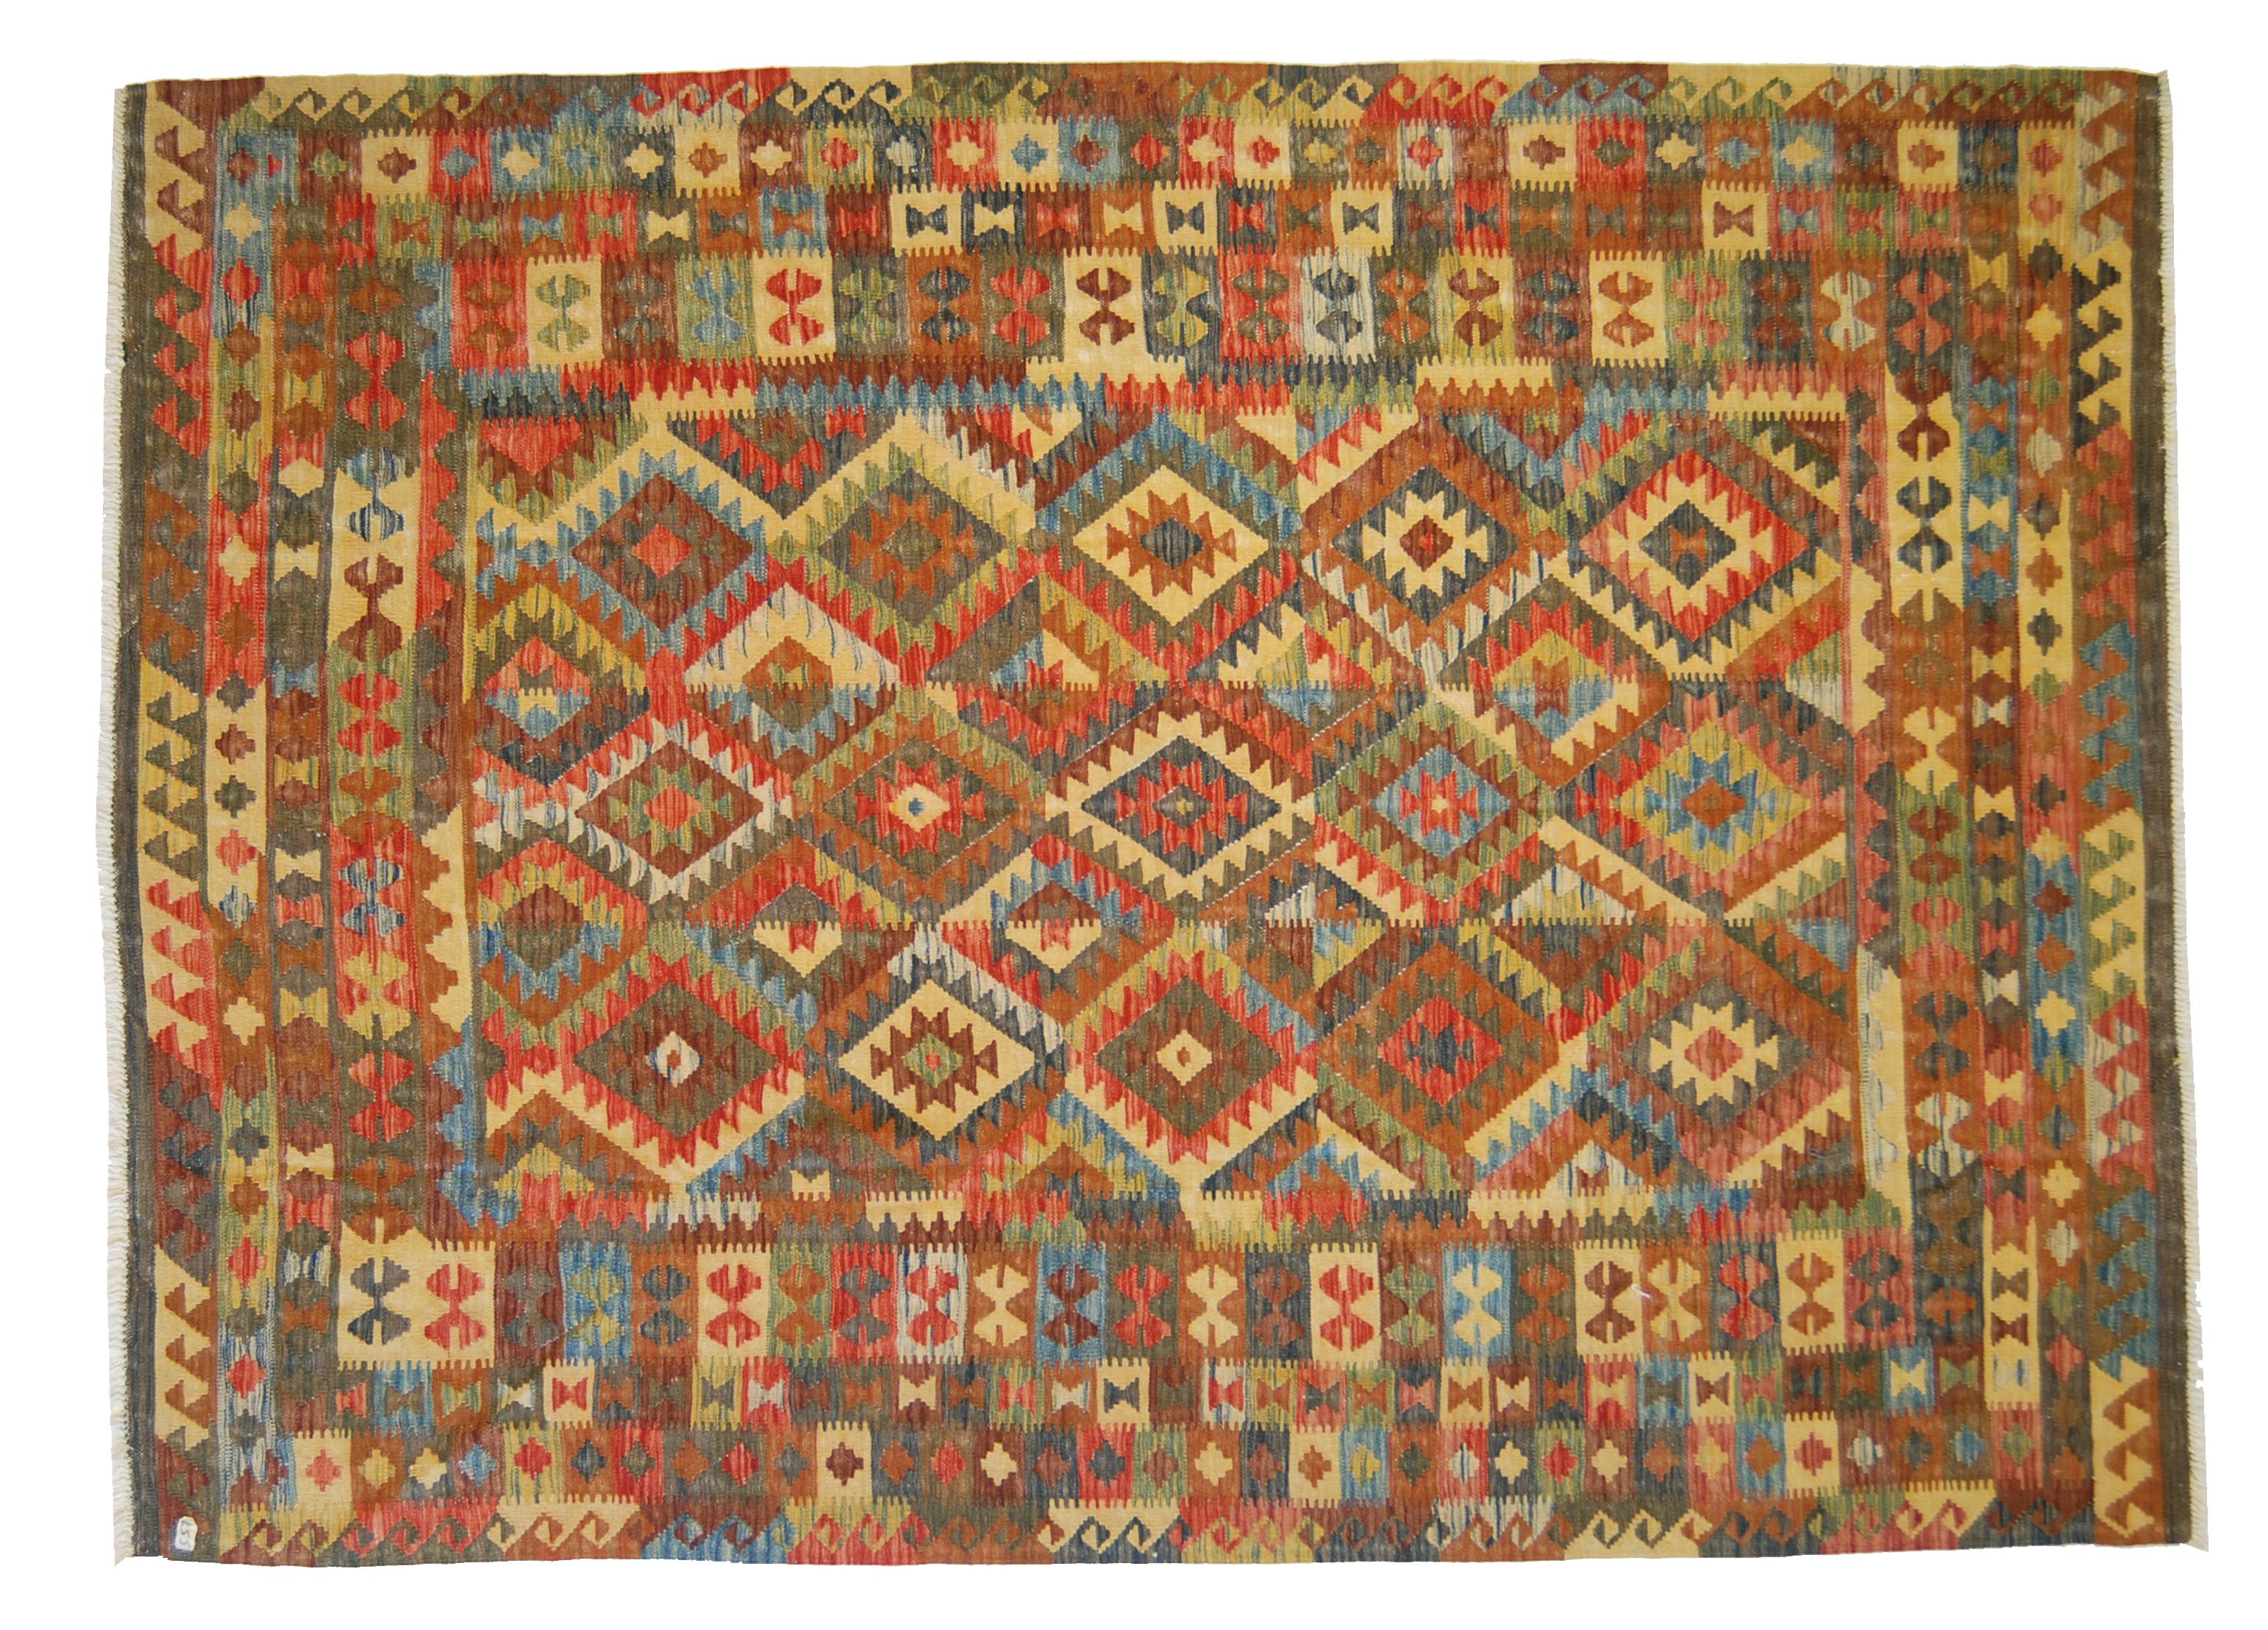 Tappeti Kilim Afgani : Nuovo tocco cromatico dei kilim afgani morandi tappeti